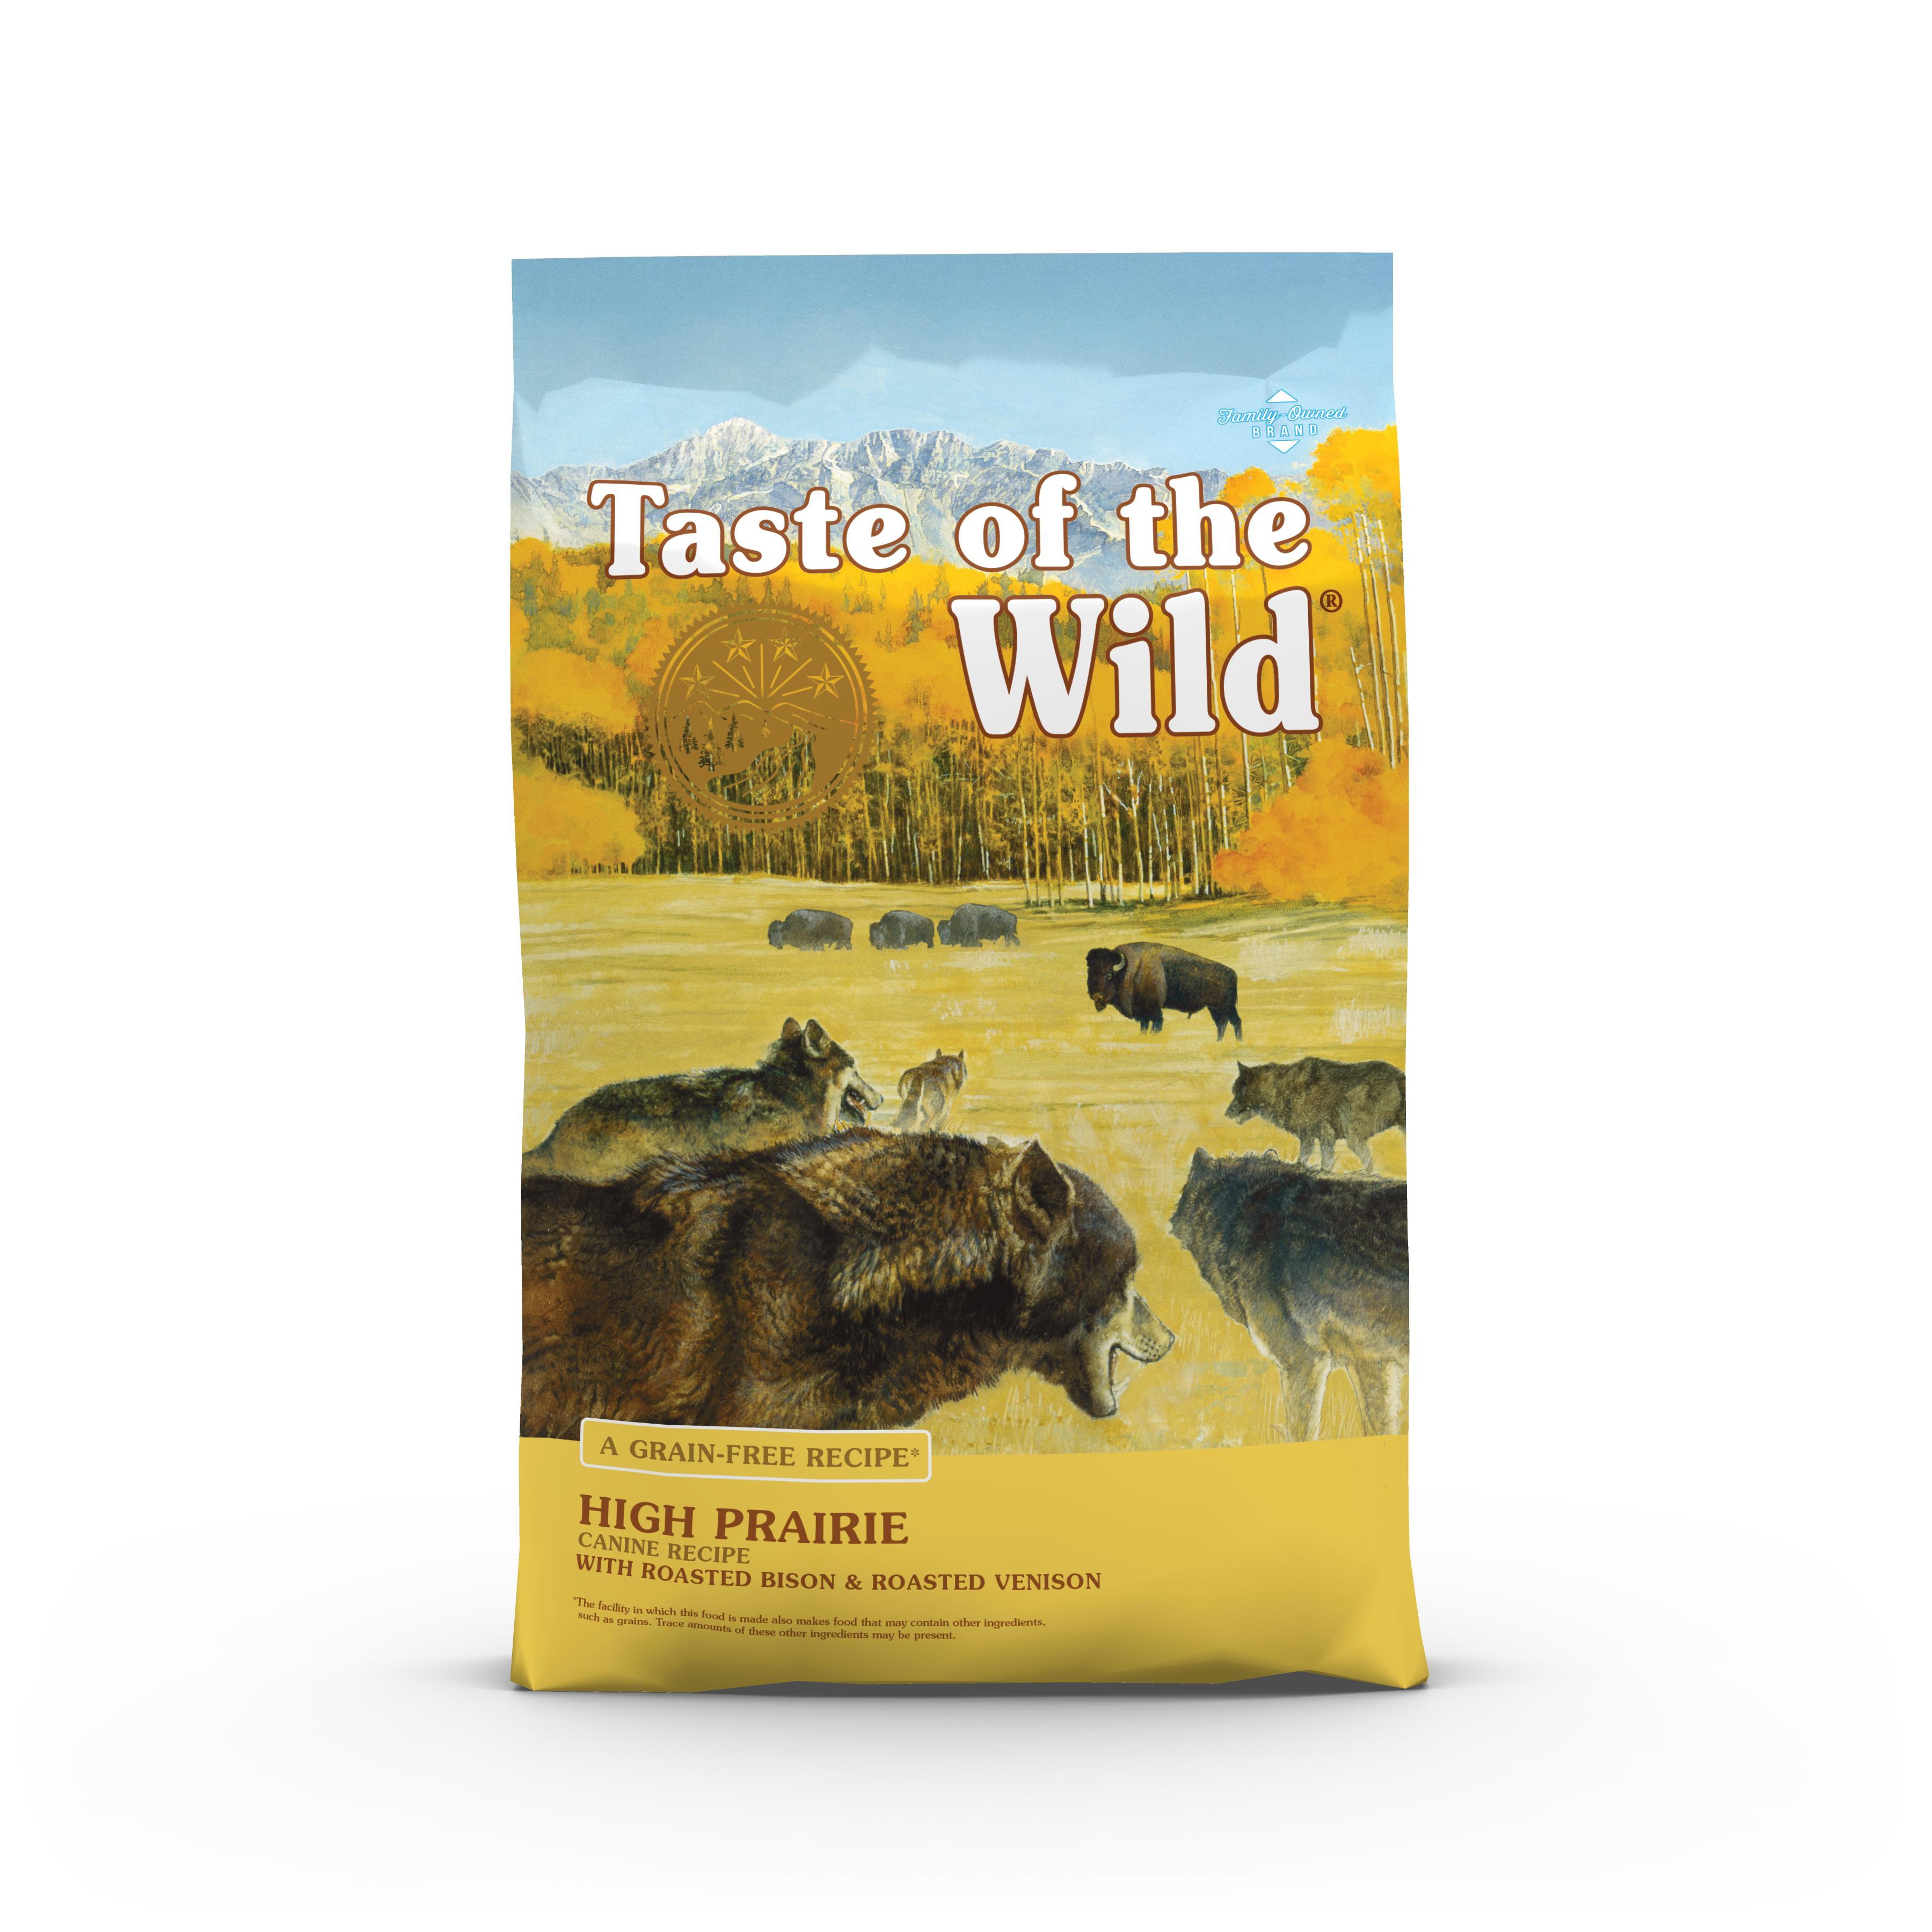 Taste of the Wild High Prairie Grain-Free Dry Dog Food, 28-lb